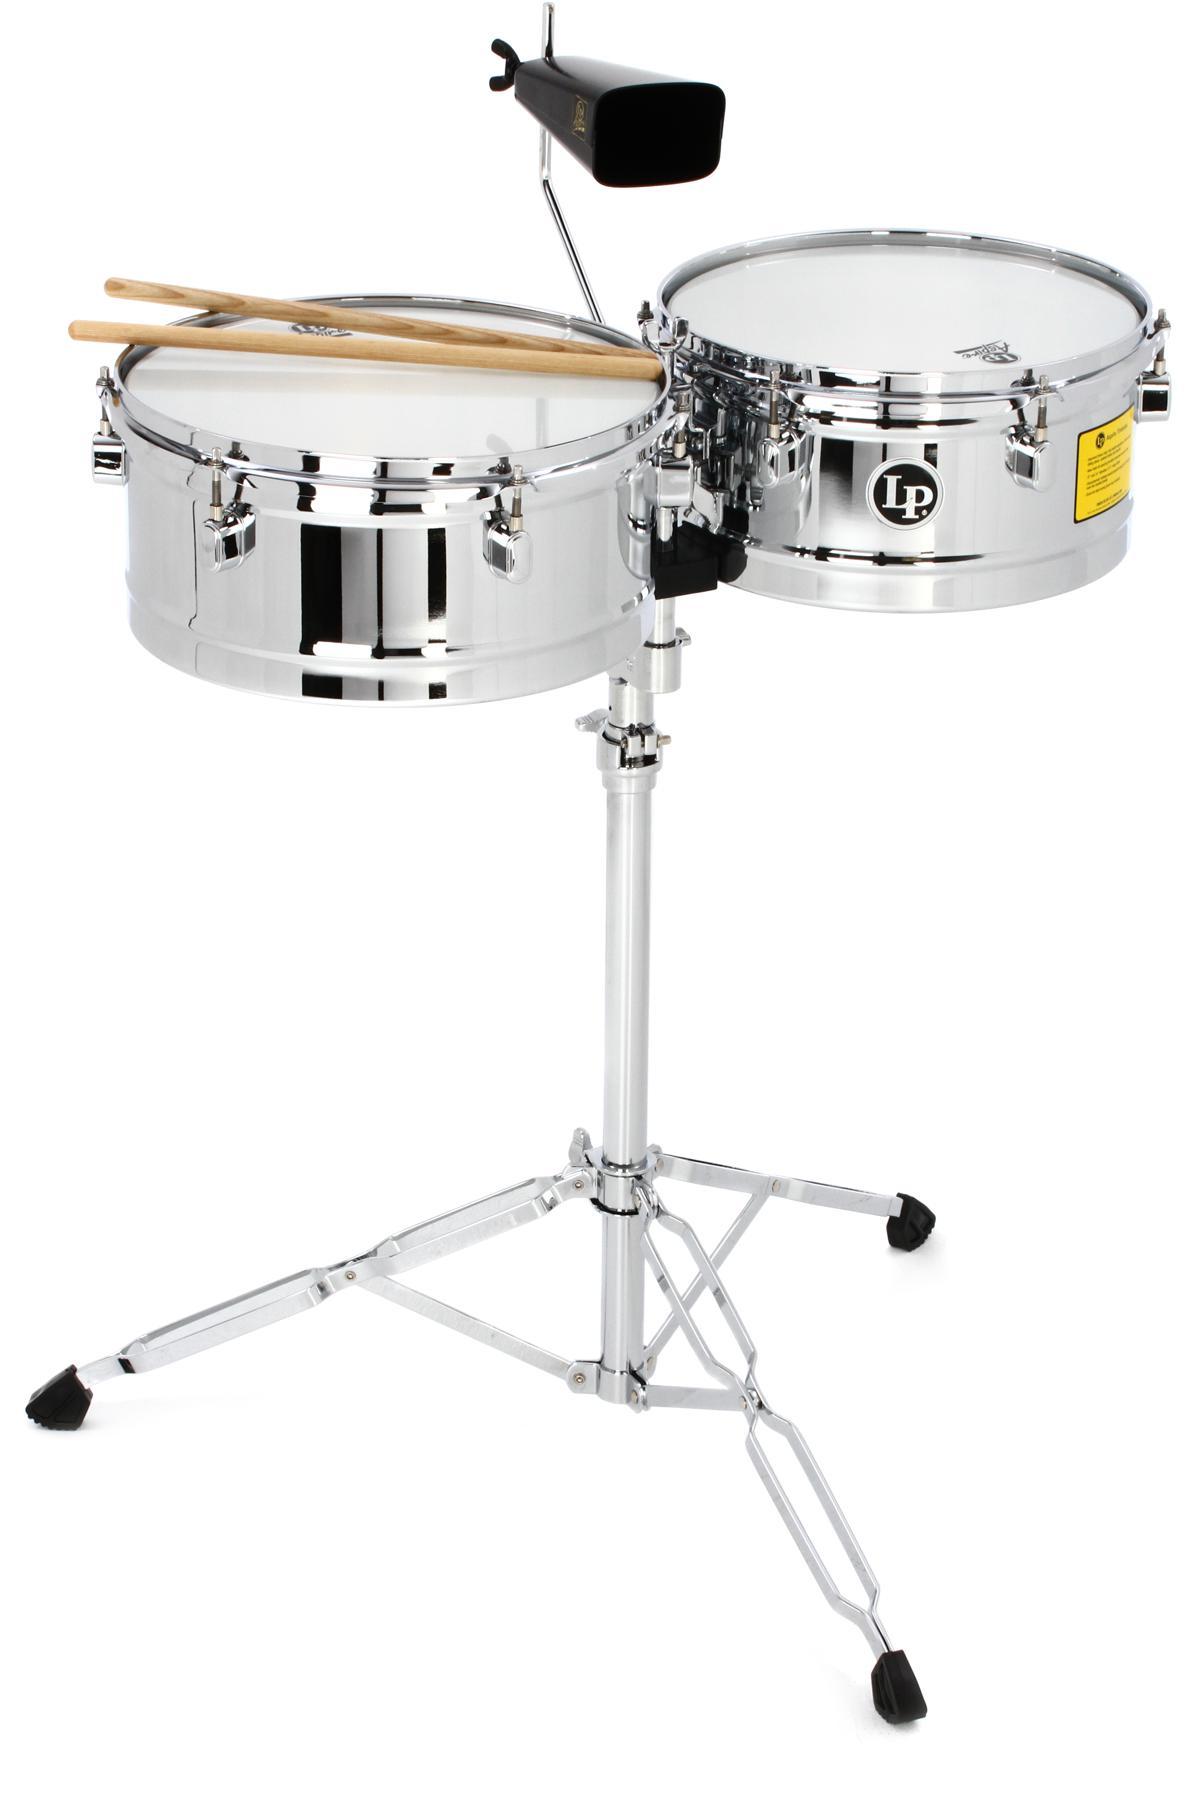 2. Latin Percussion LPA256 Aspire Series Timbale Set